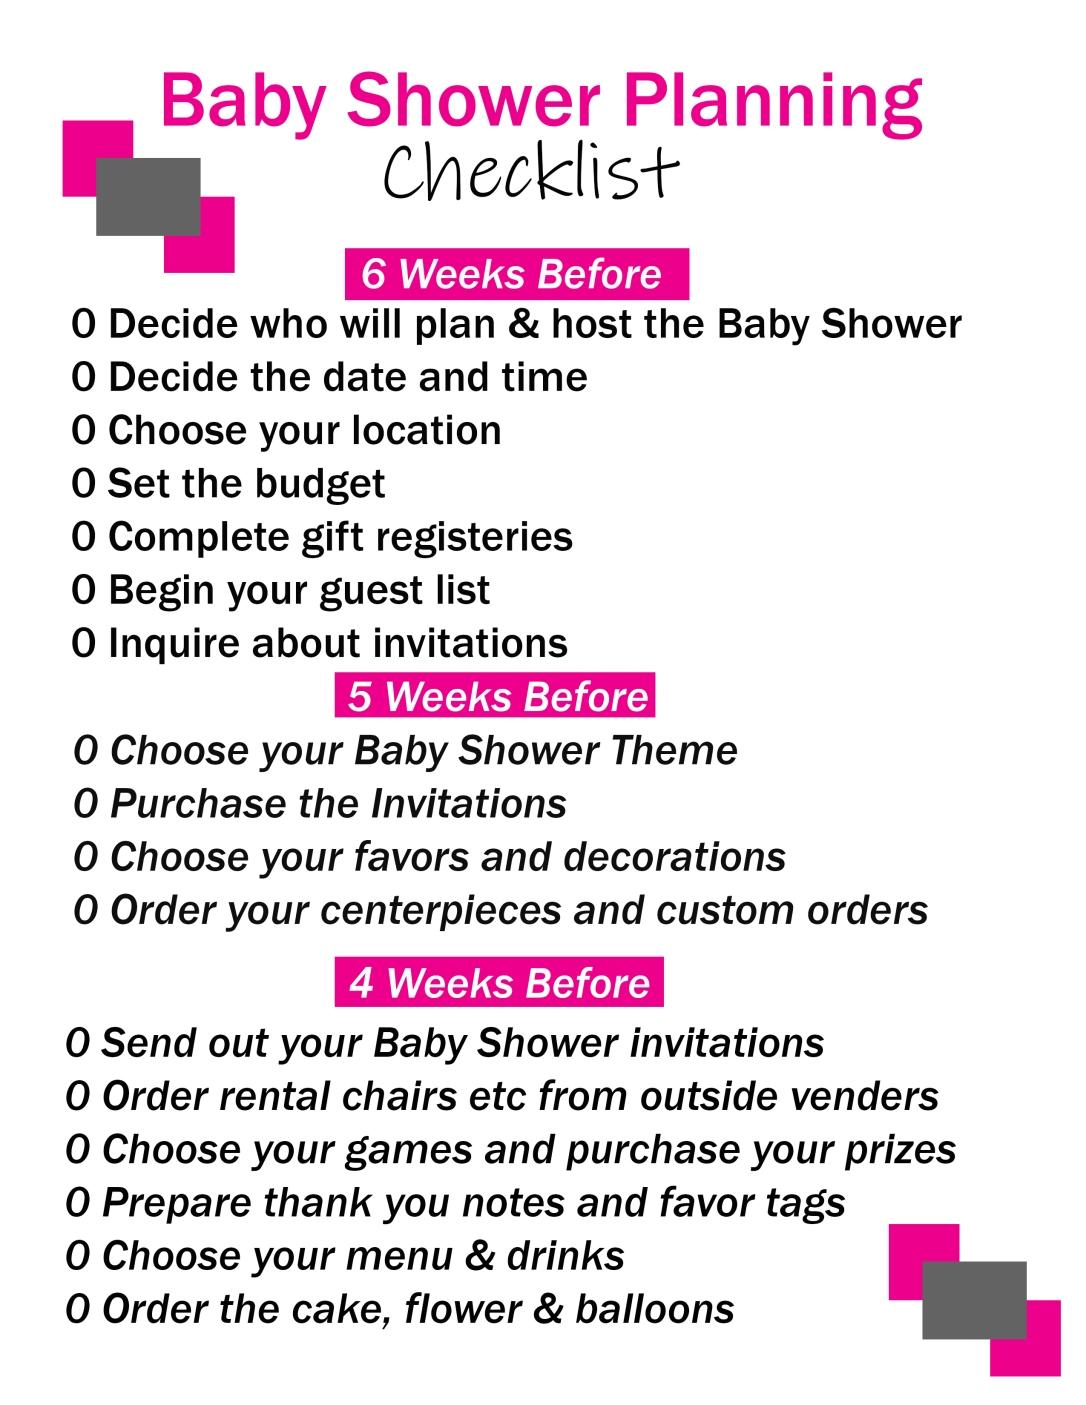 Baby Shower Checklist Printable